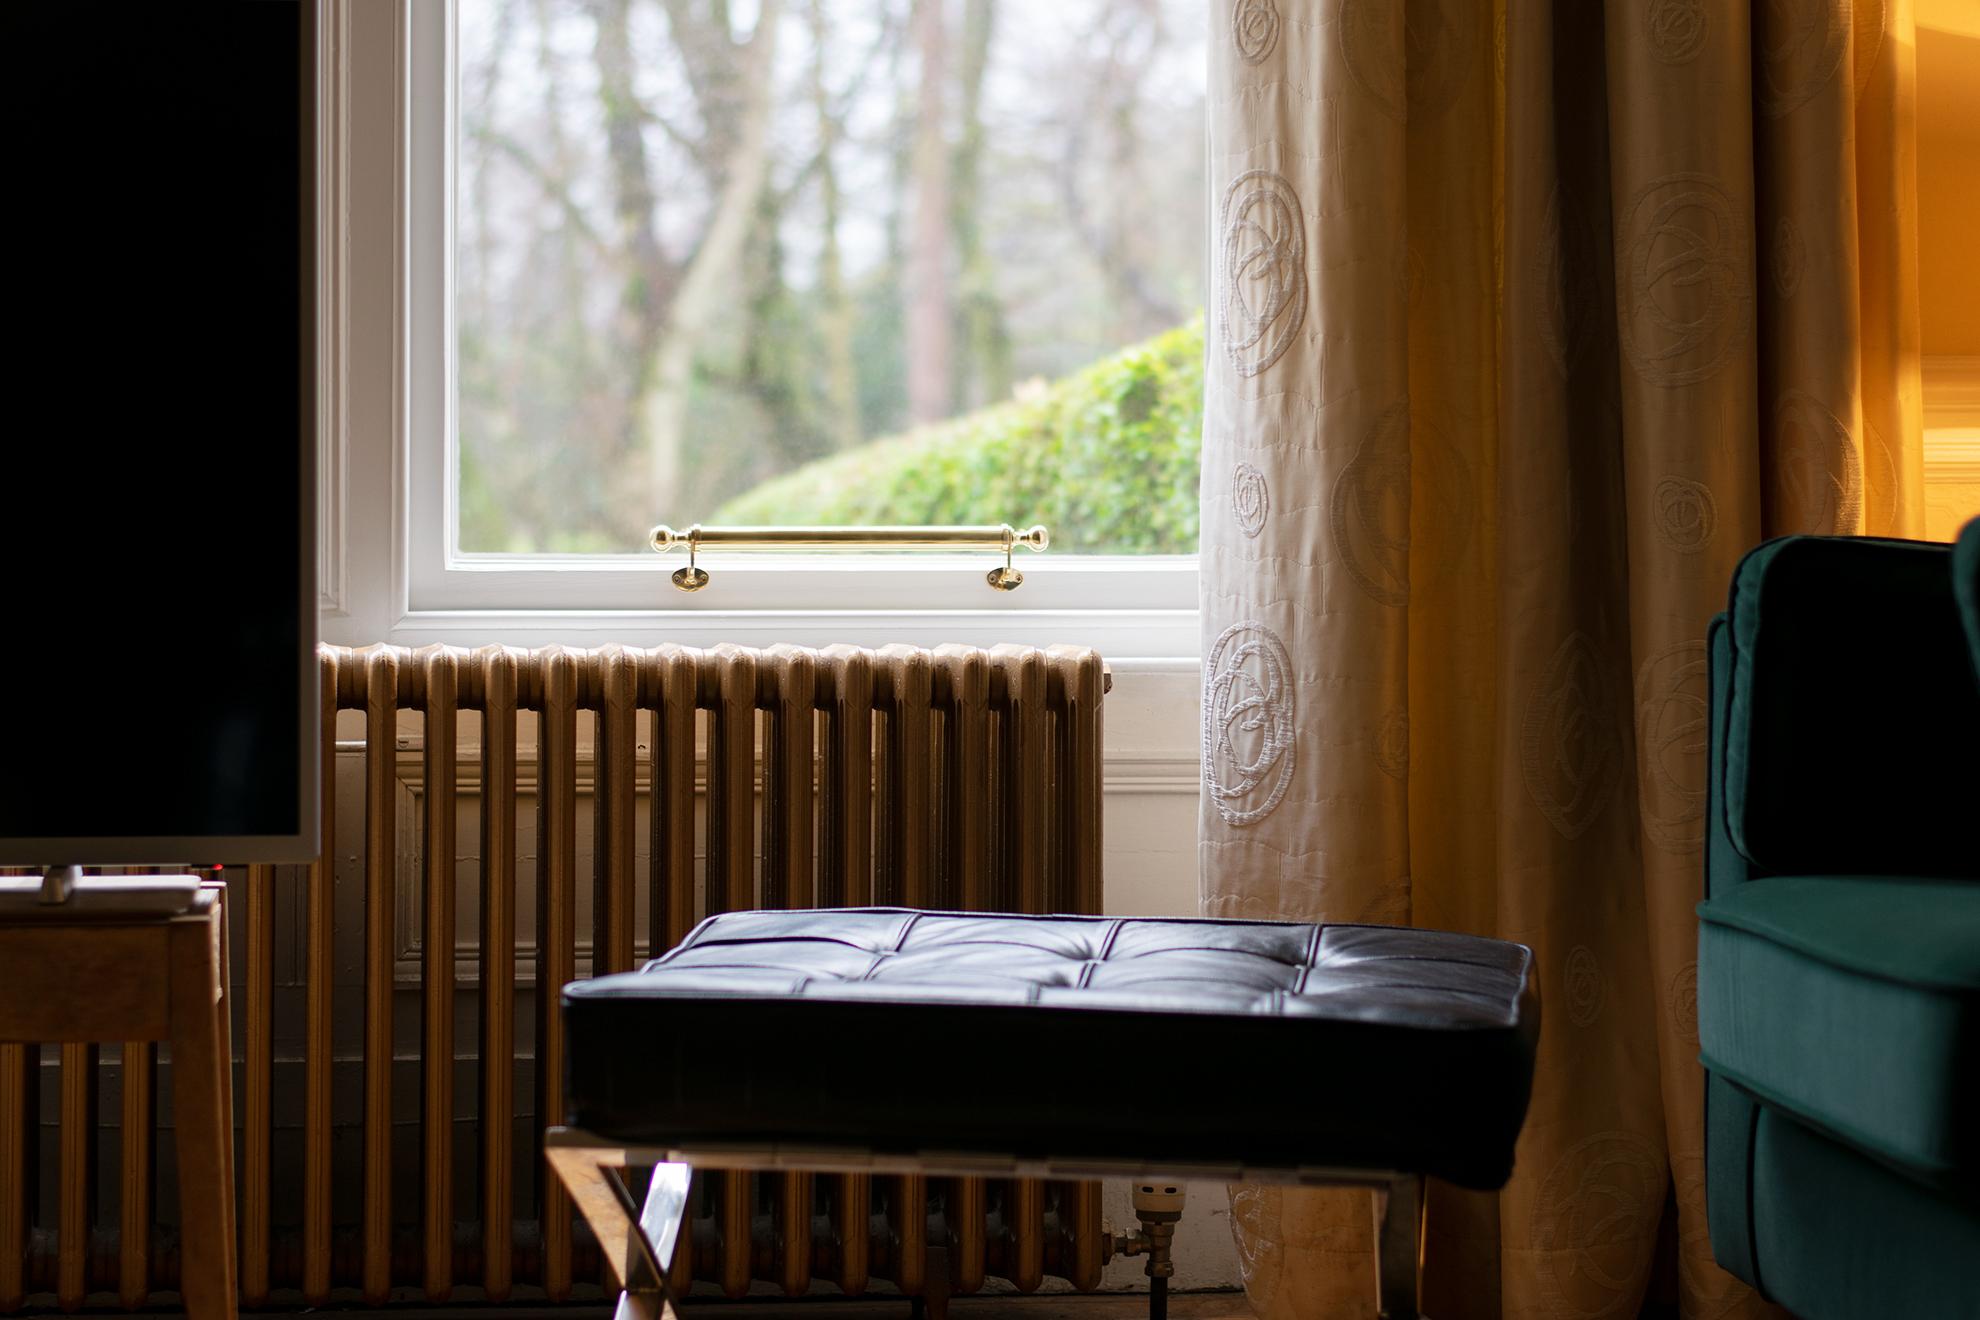 Sash window repair and restoration, Glasgow